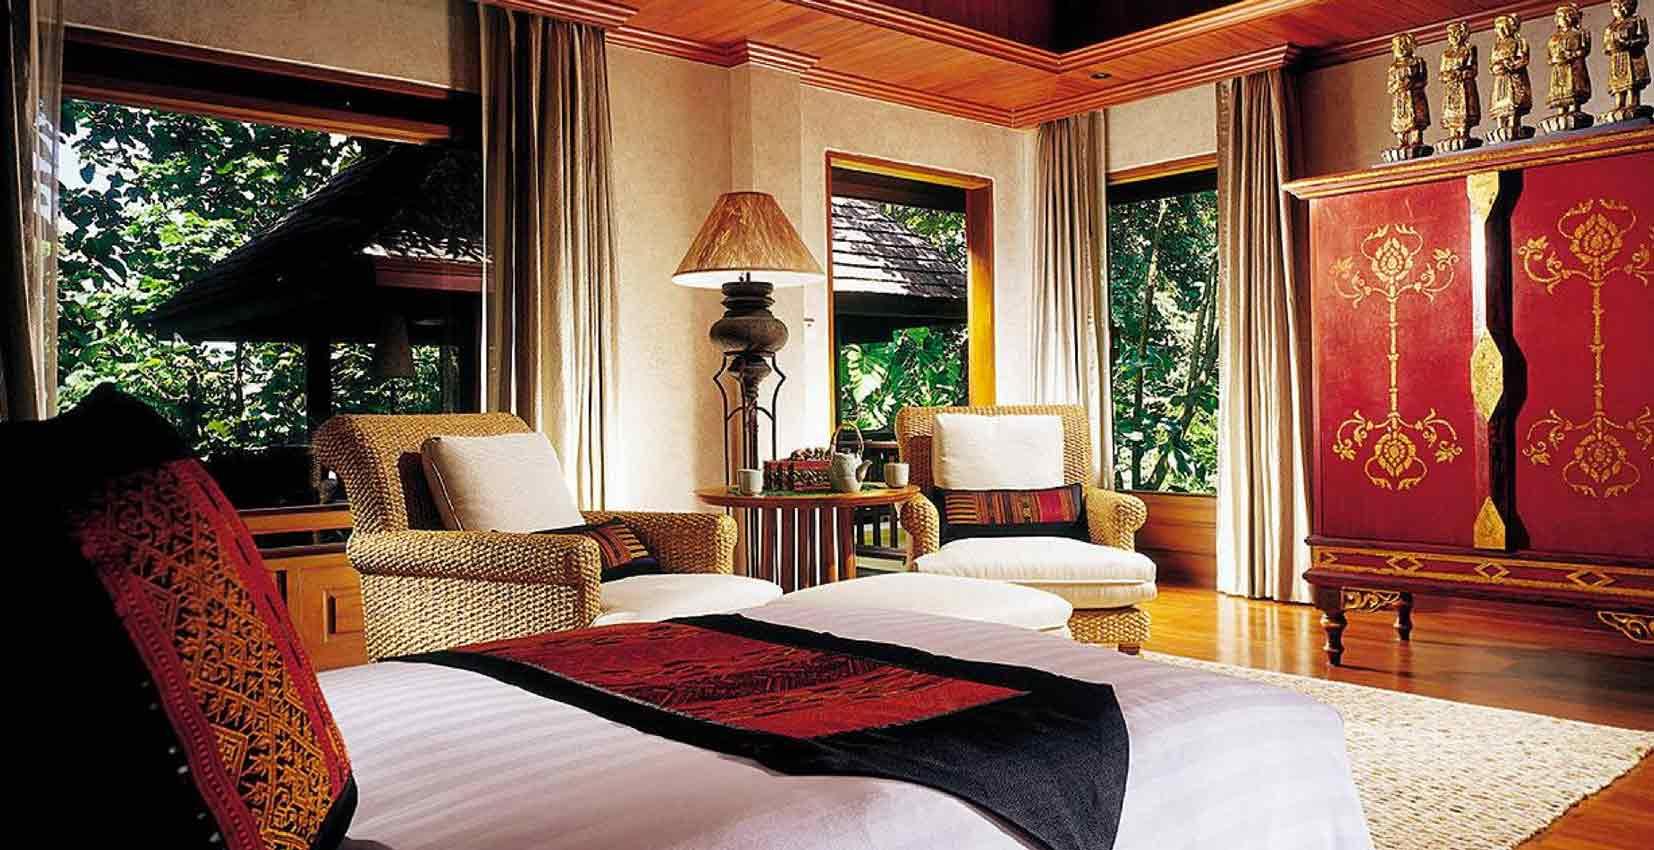 Pavillon-Four-seasons-chiang-mai-smart-family-travel